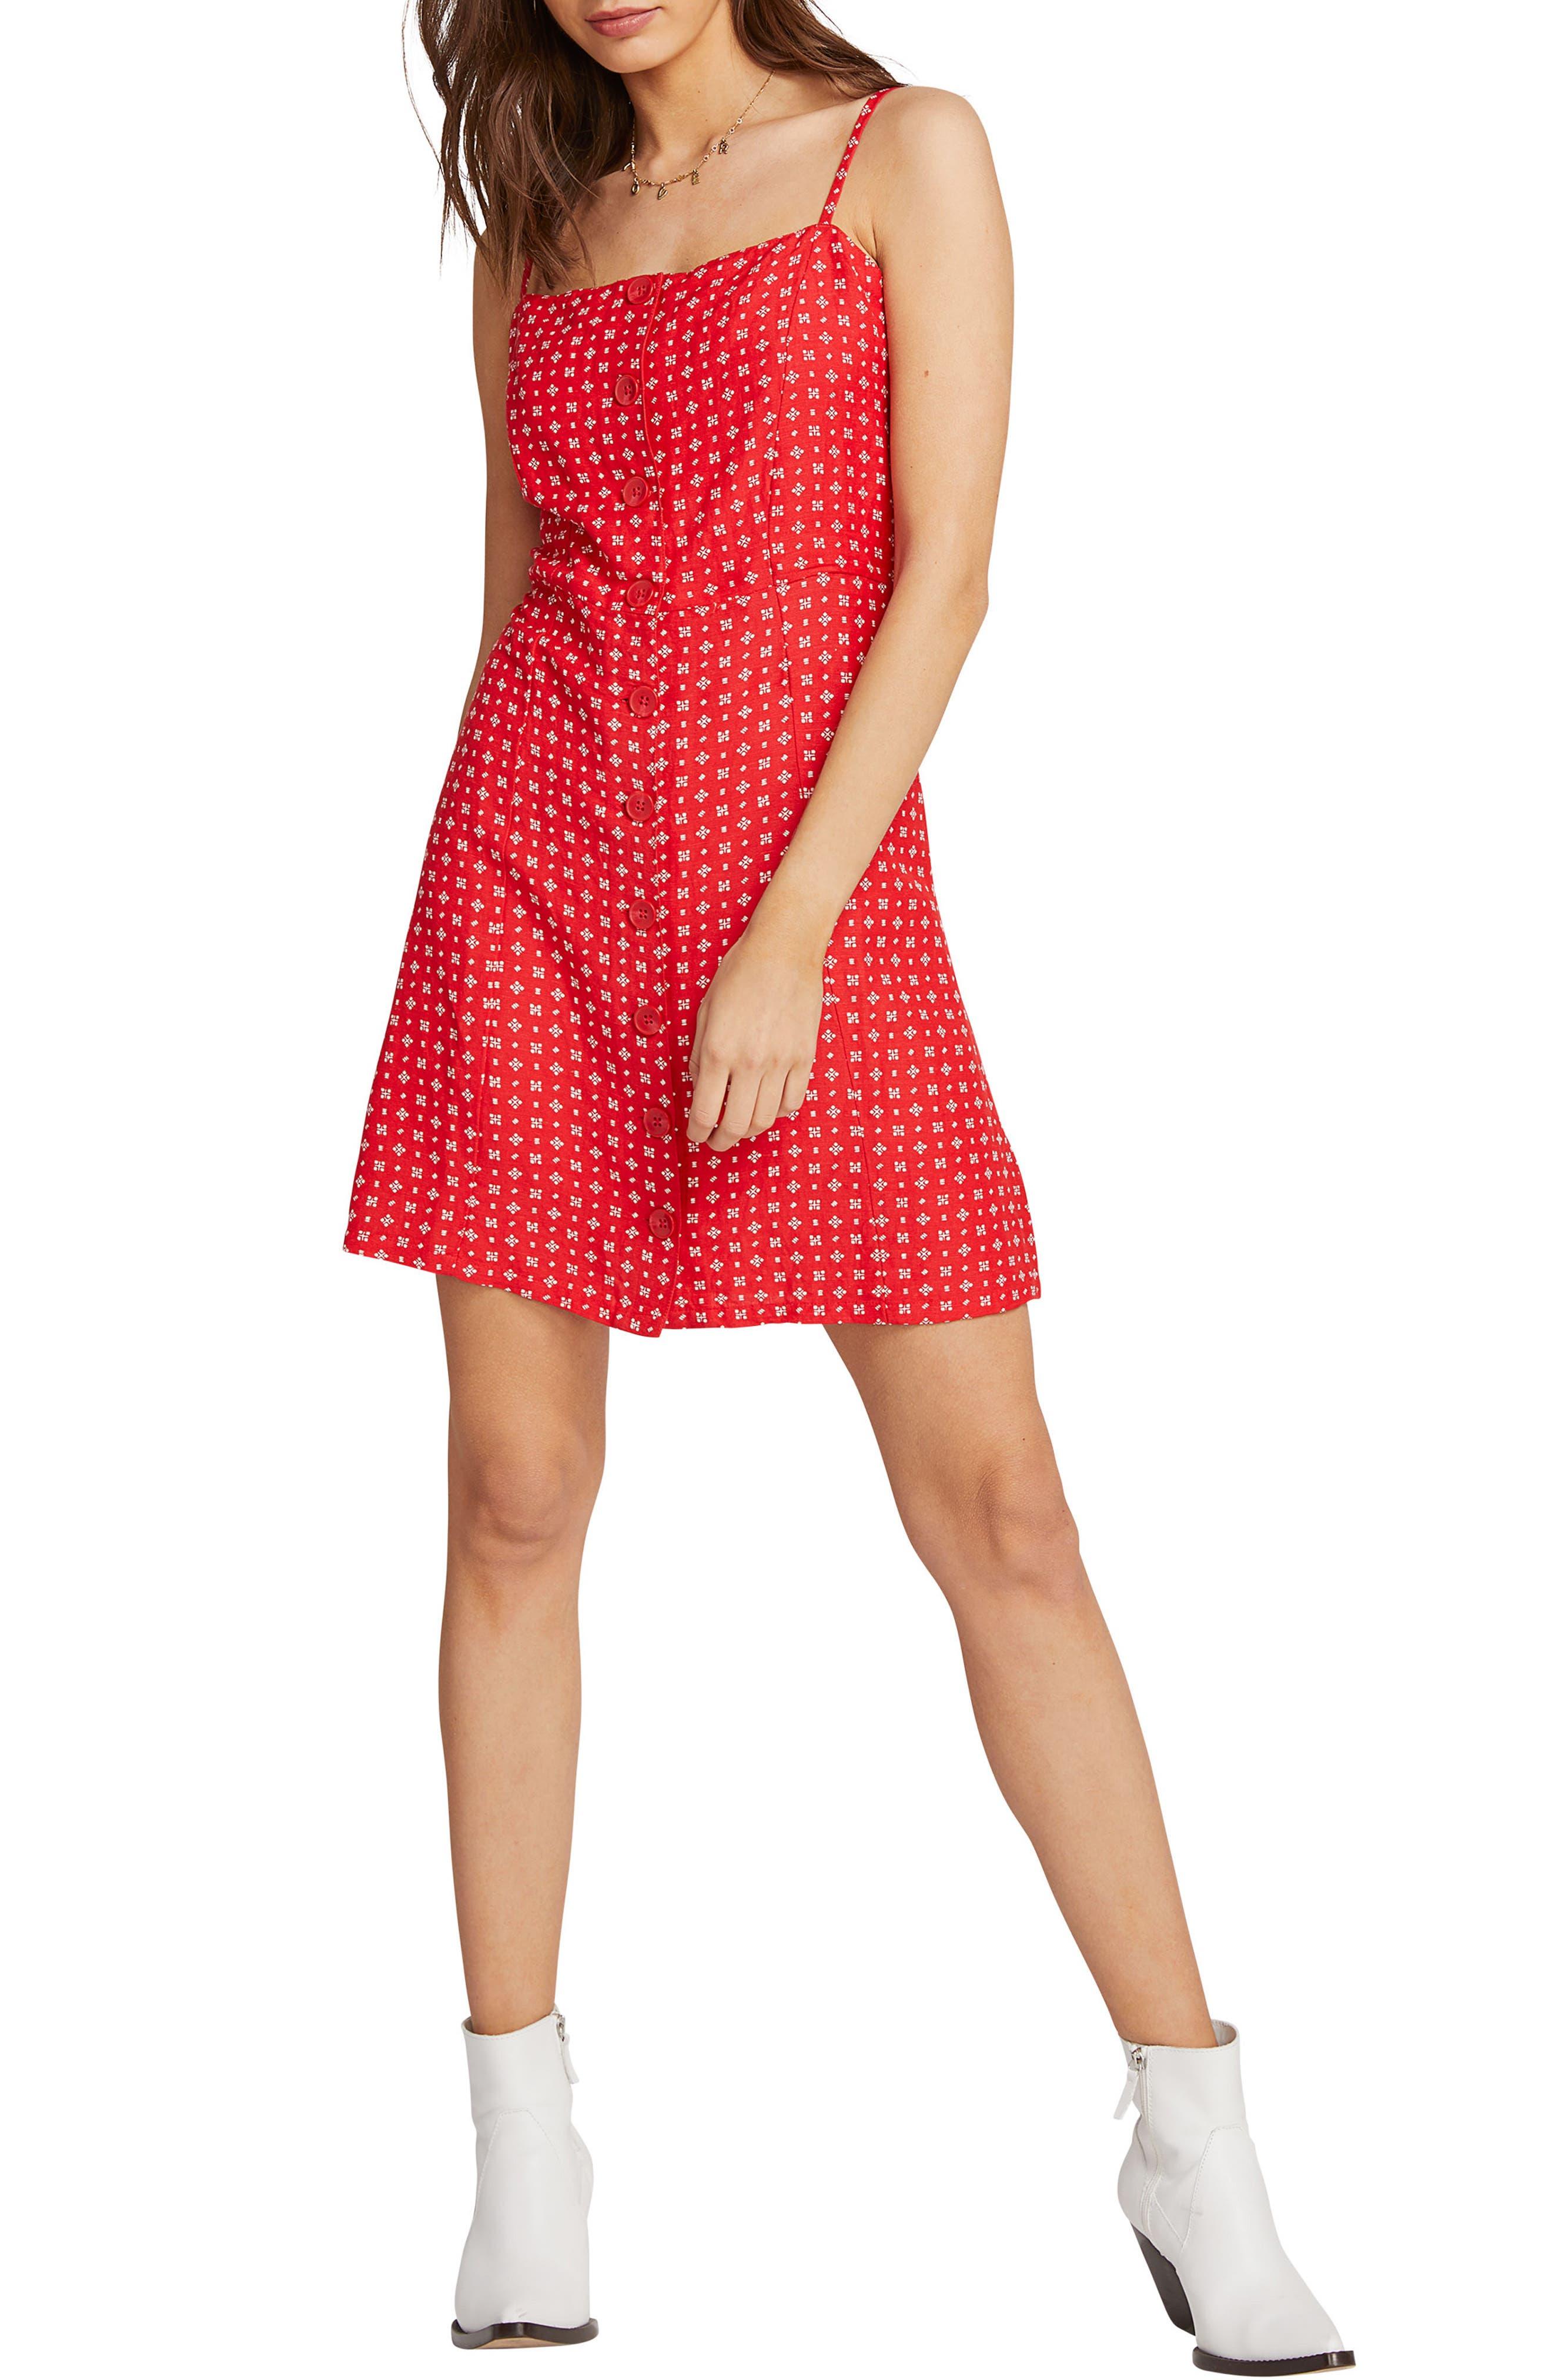 Volcom Salt And Sun Minidress, Red